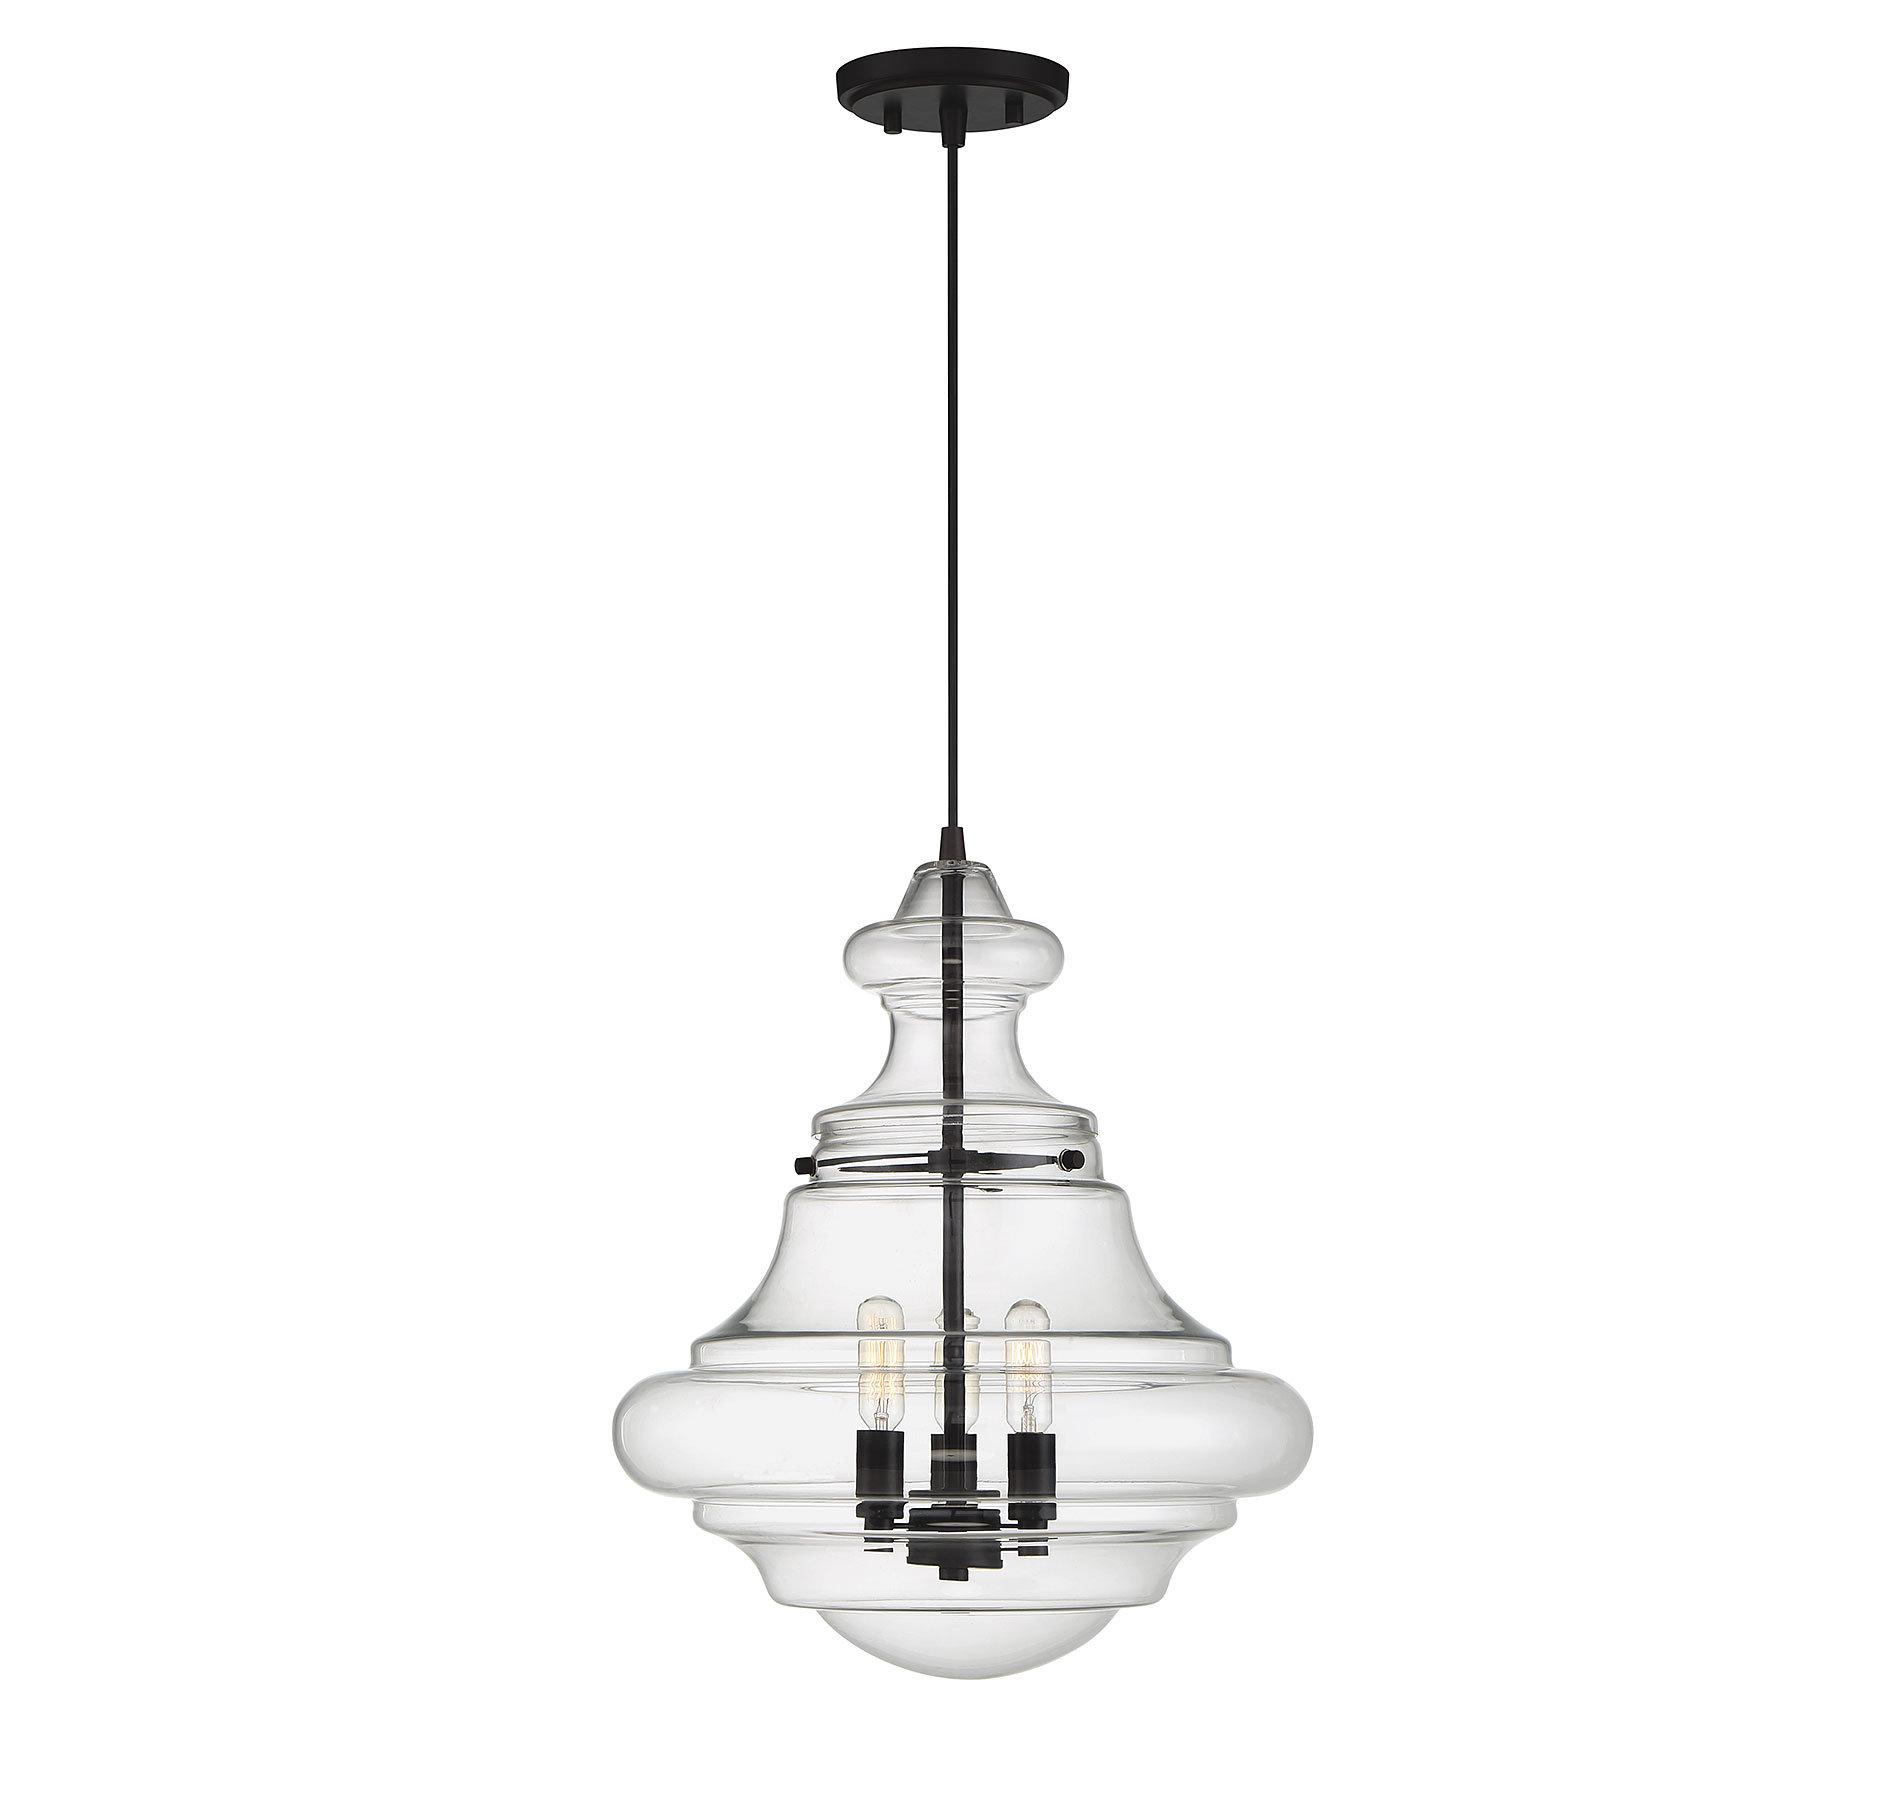 Edford 3-Light Single Schoolhouse Pendant in Akakios 1-Light Single Bell Pendants (Image 12 of 30)